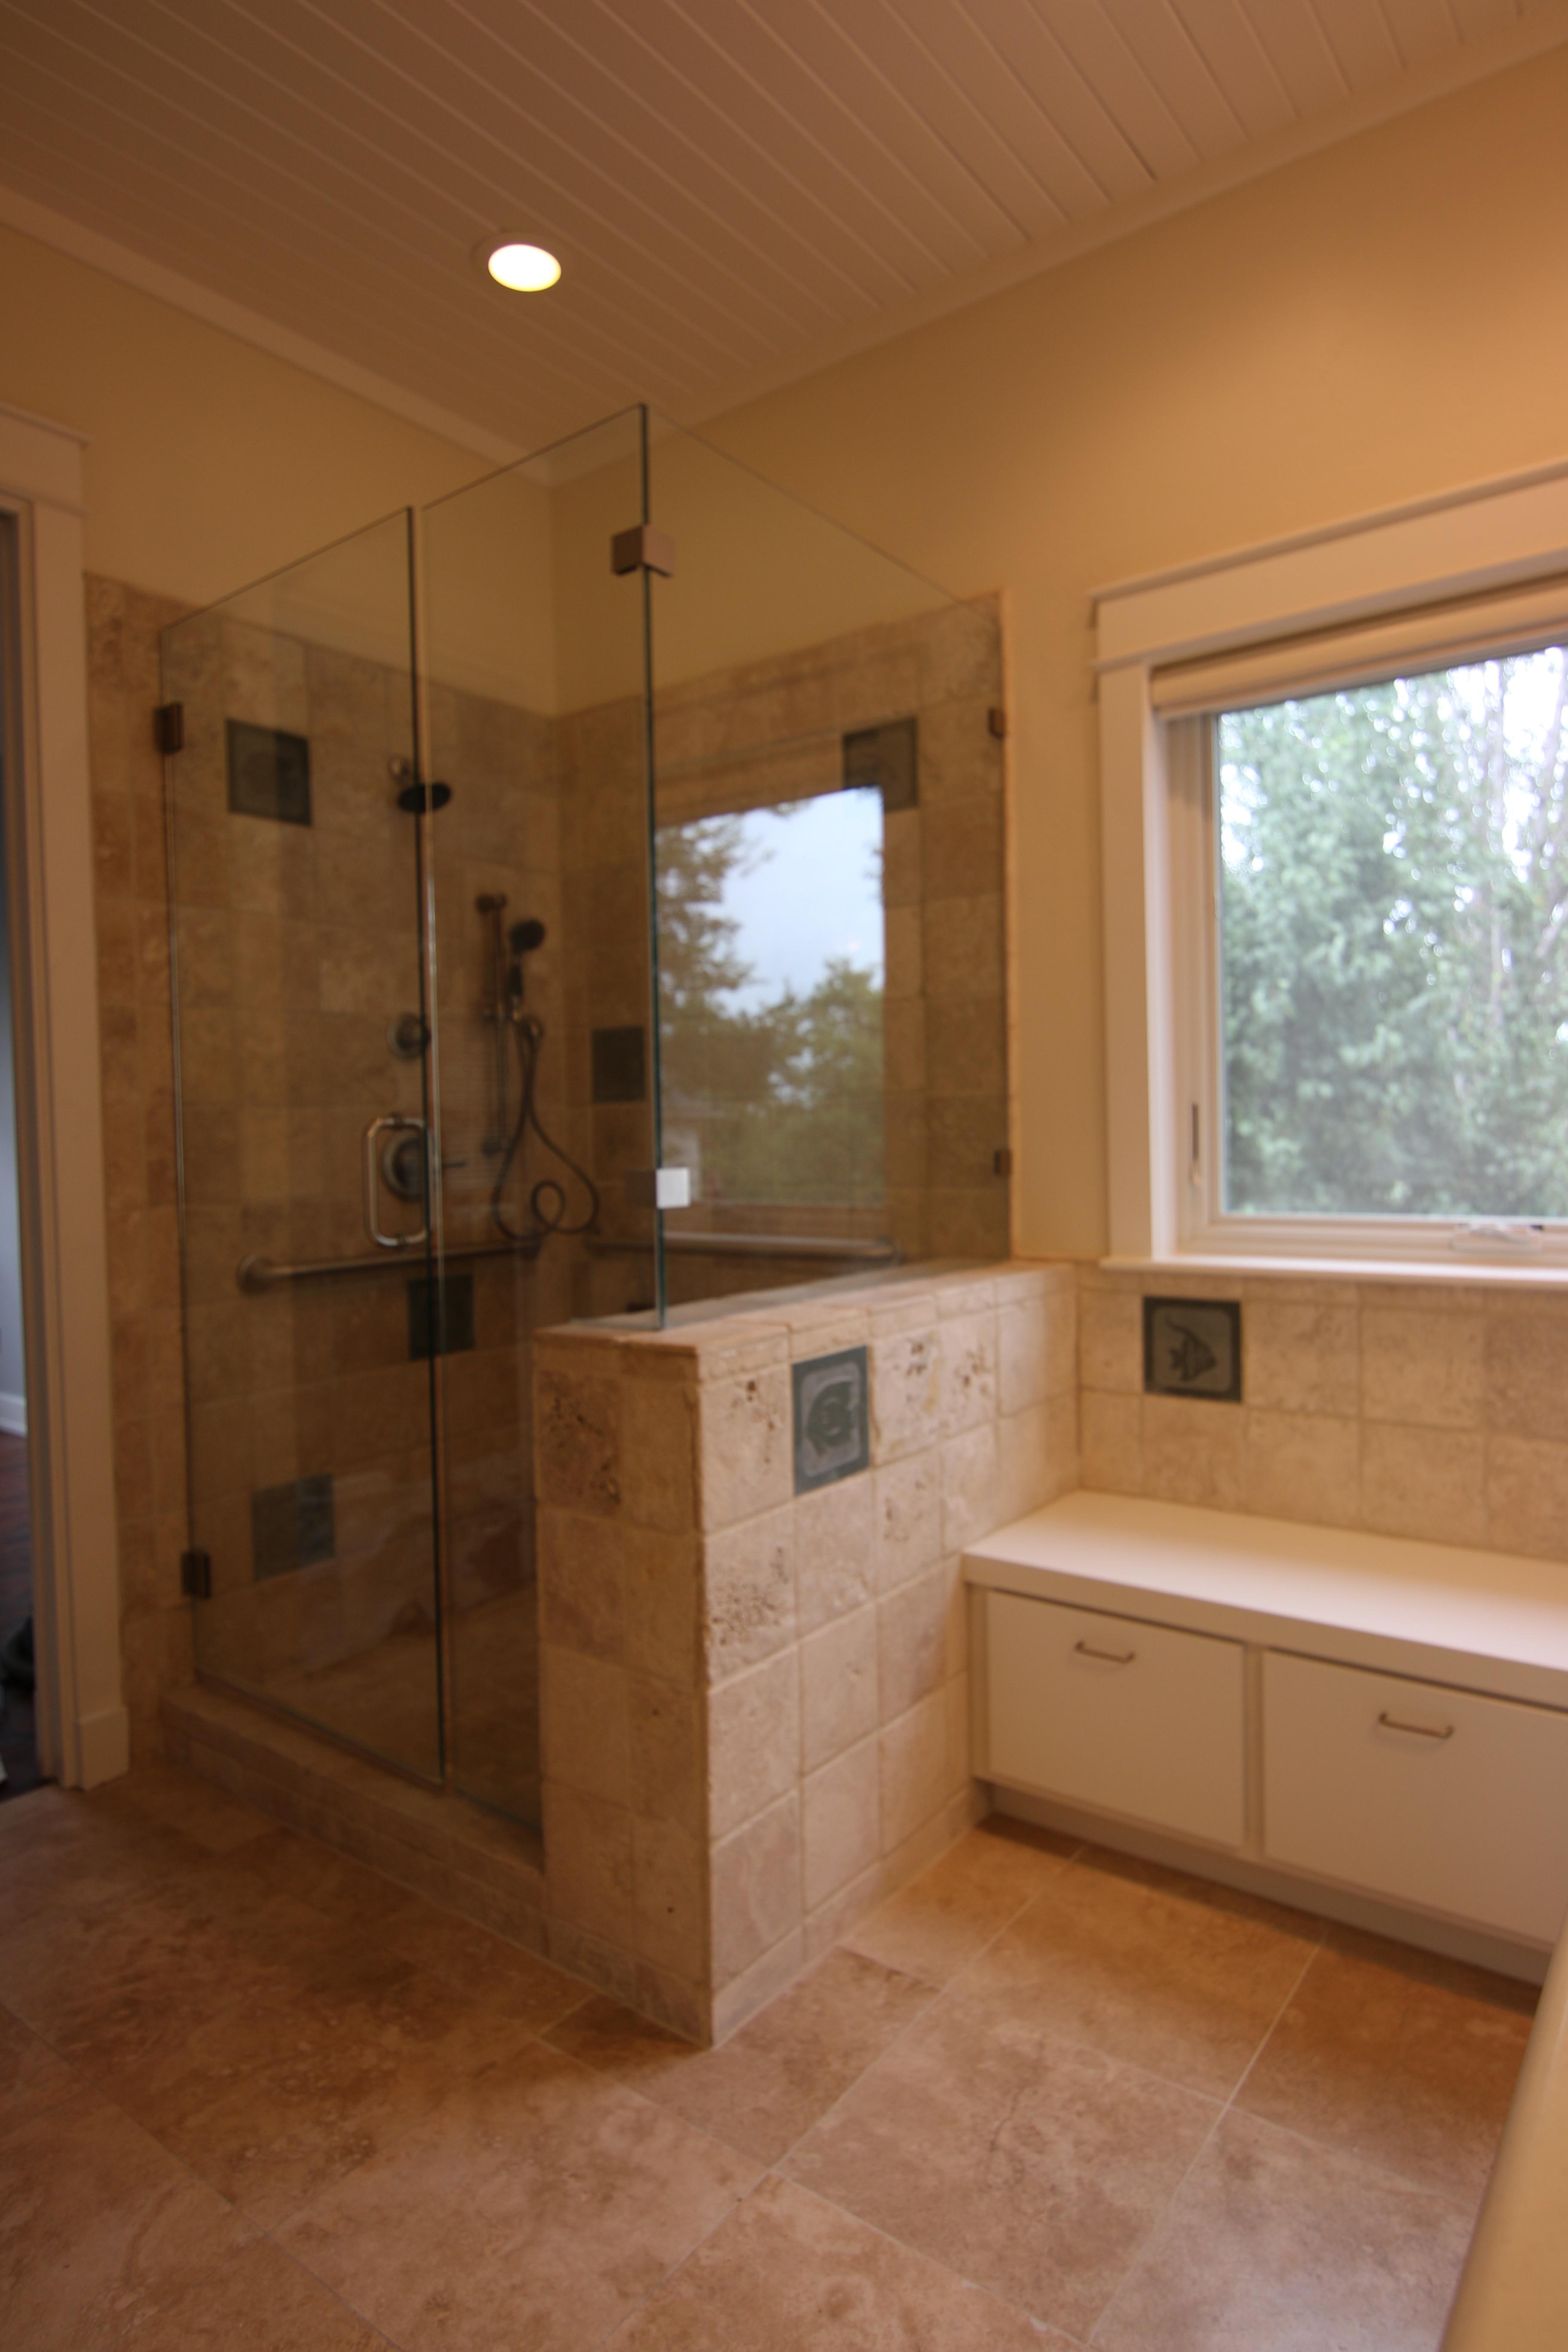 Fine Kitchen Upgrades Bathroom Upgrades Fine Cabinetry Aging In - Bathroom remodeling austin texas